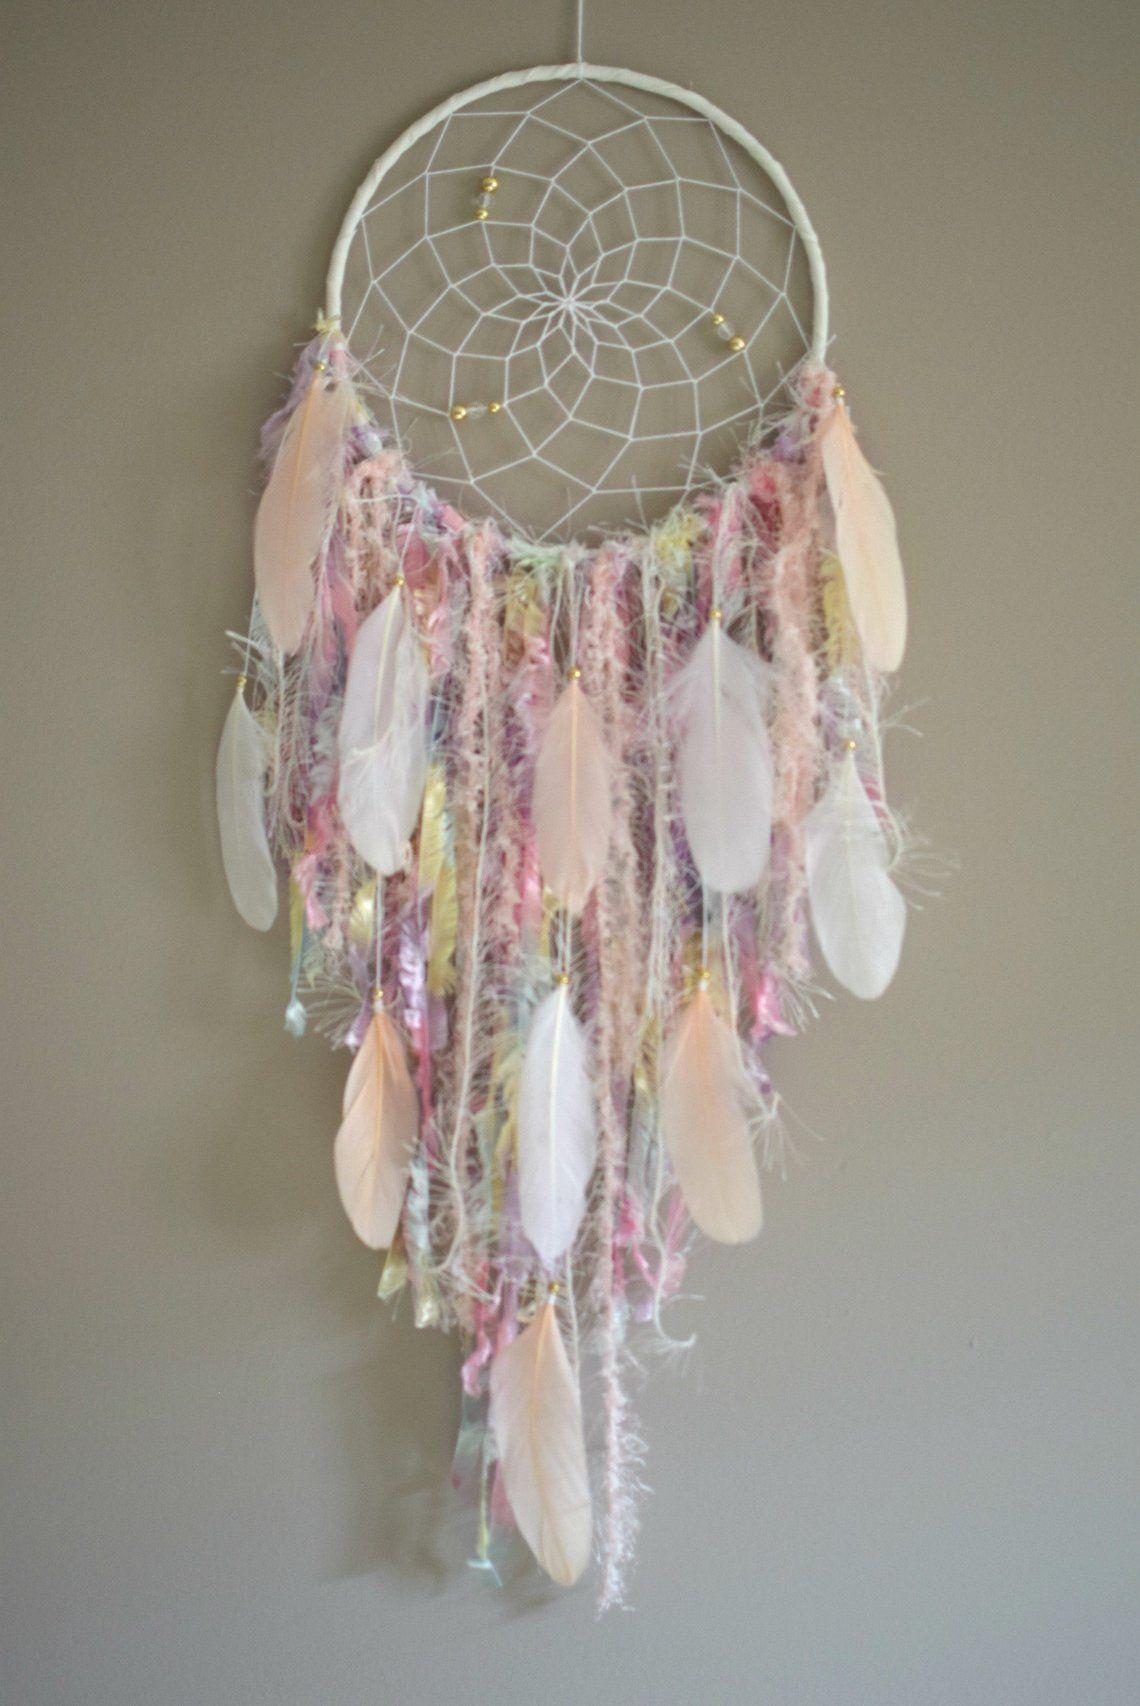 Large Dream Catcher Girls Room Decor Dreamcatcher Wall Hanging | Etsy